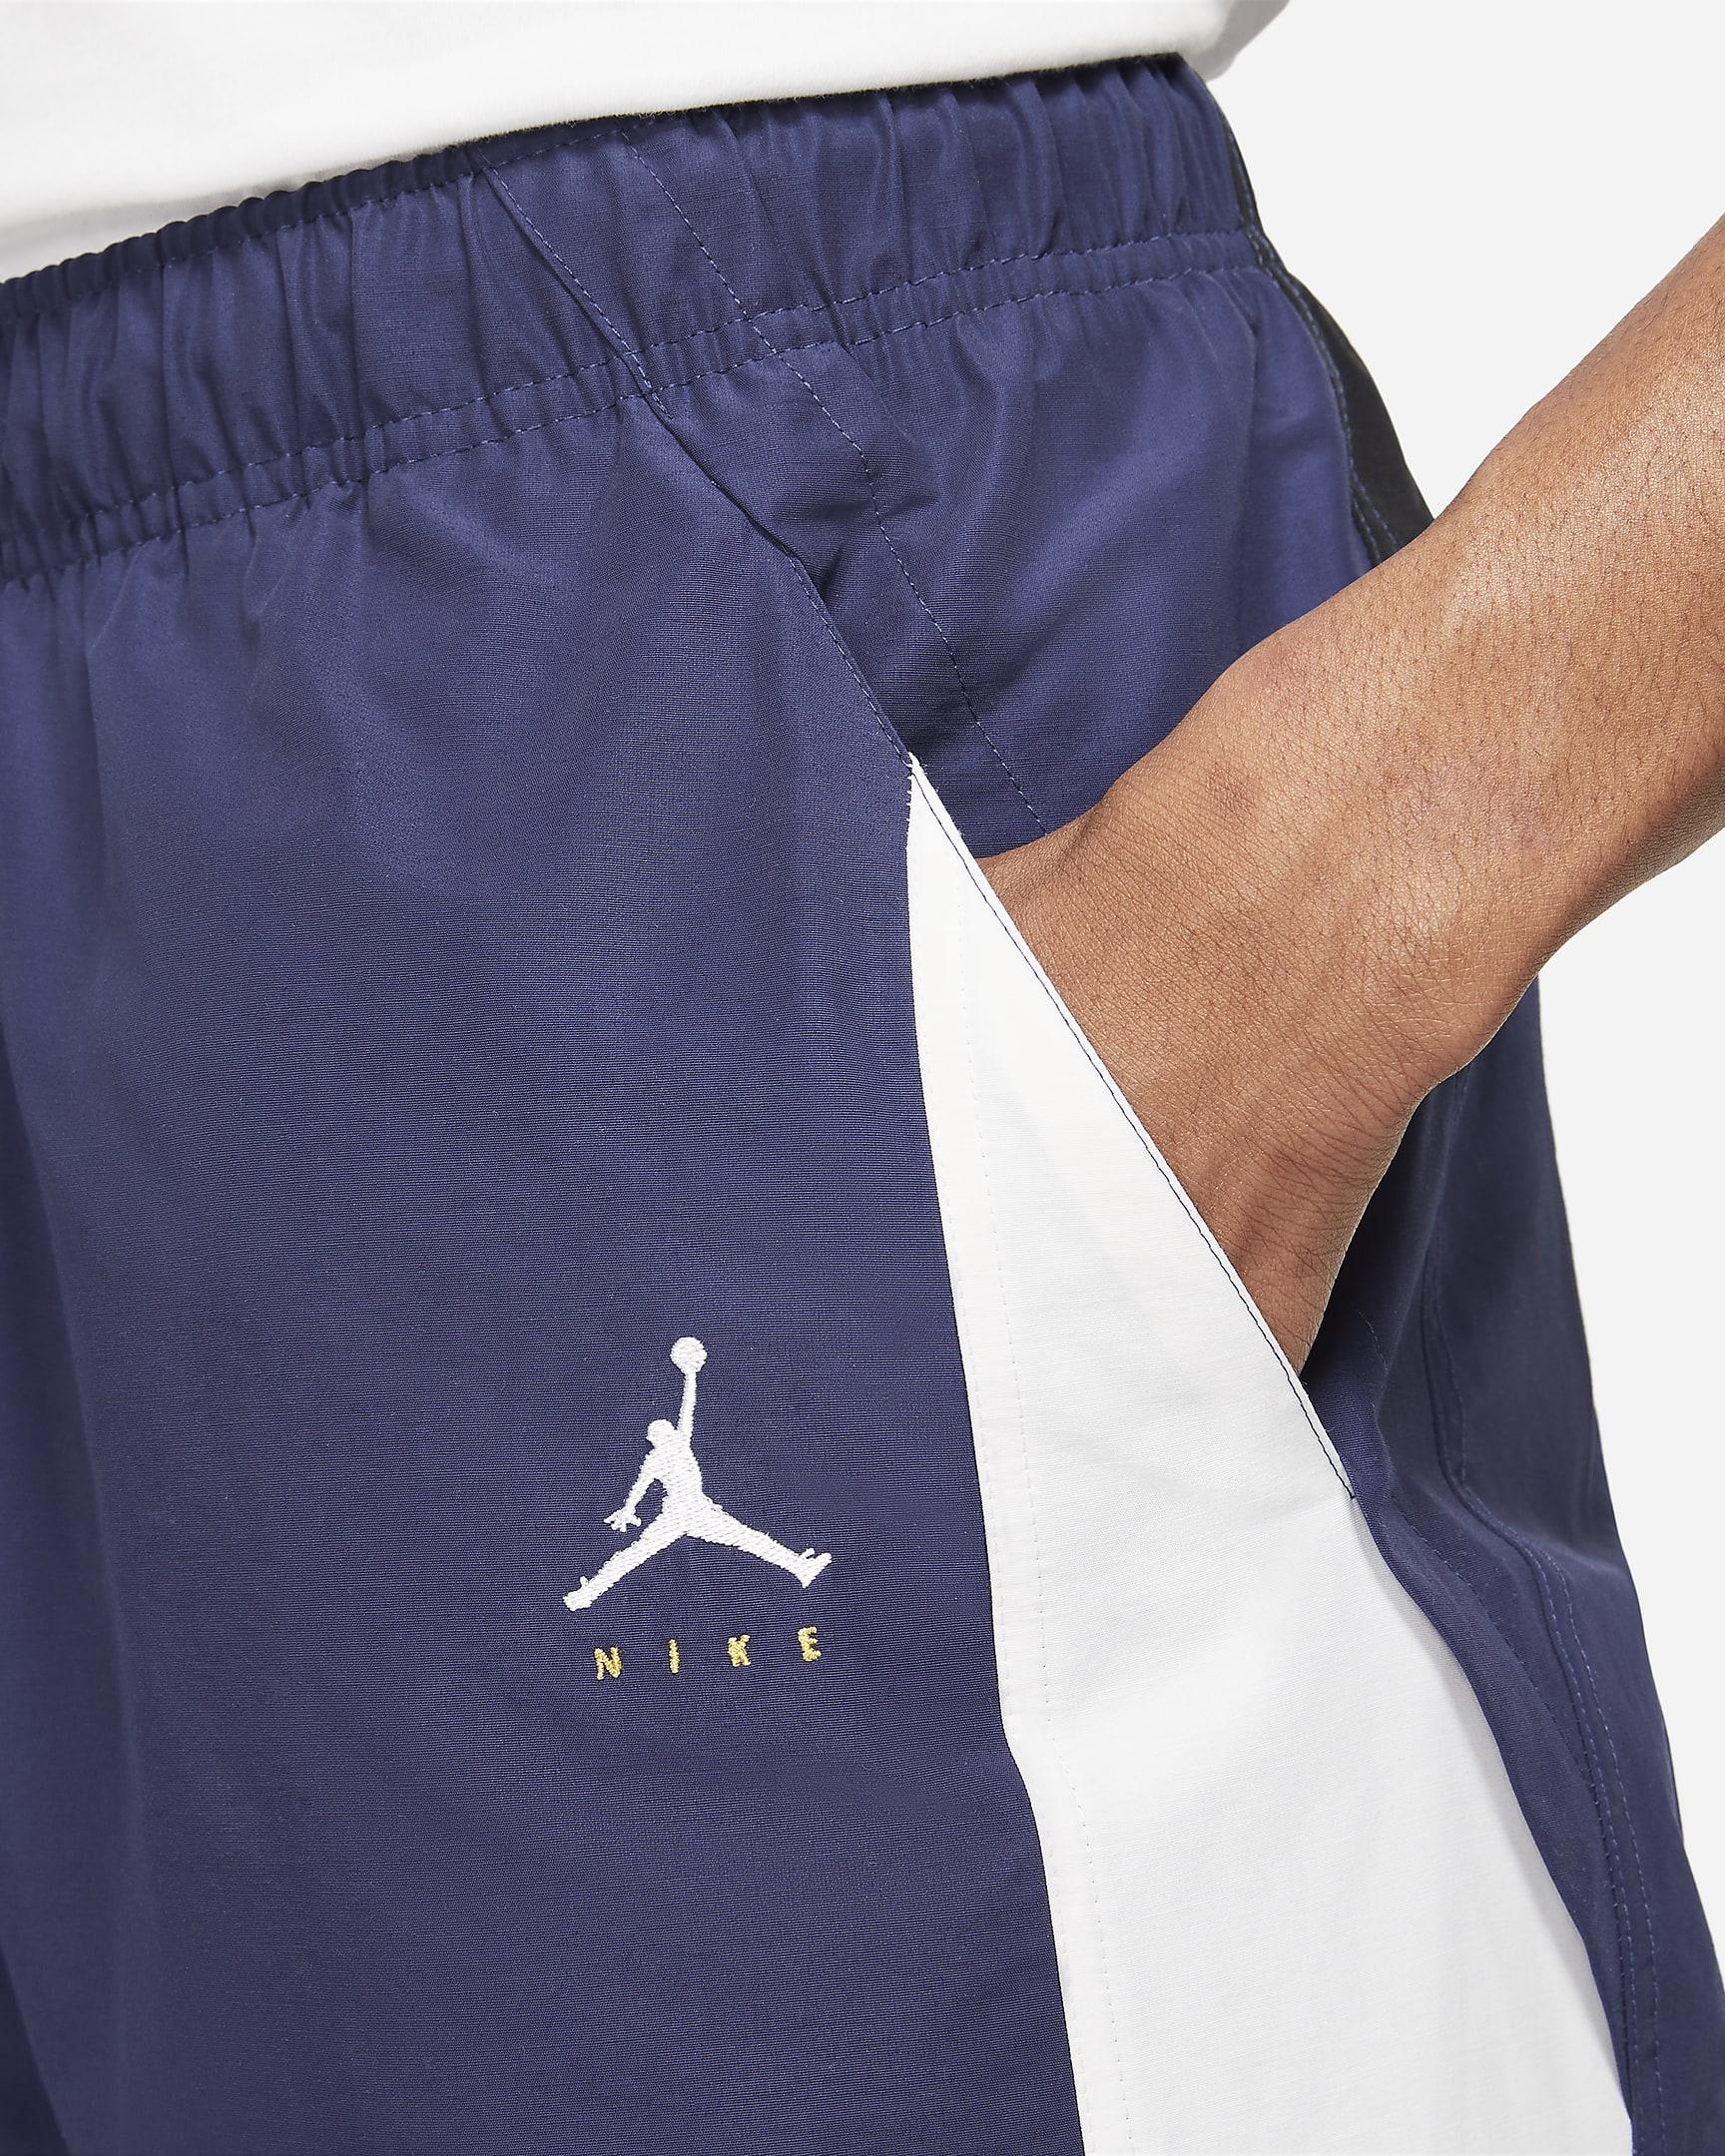 jordan-jumpman-mens-woven-pants-4BkNRR-2.png